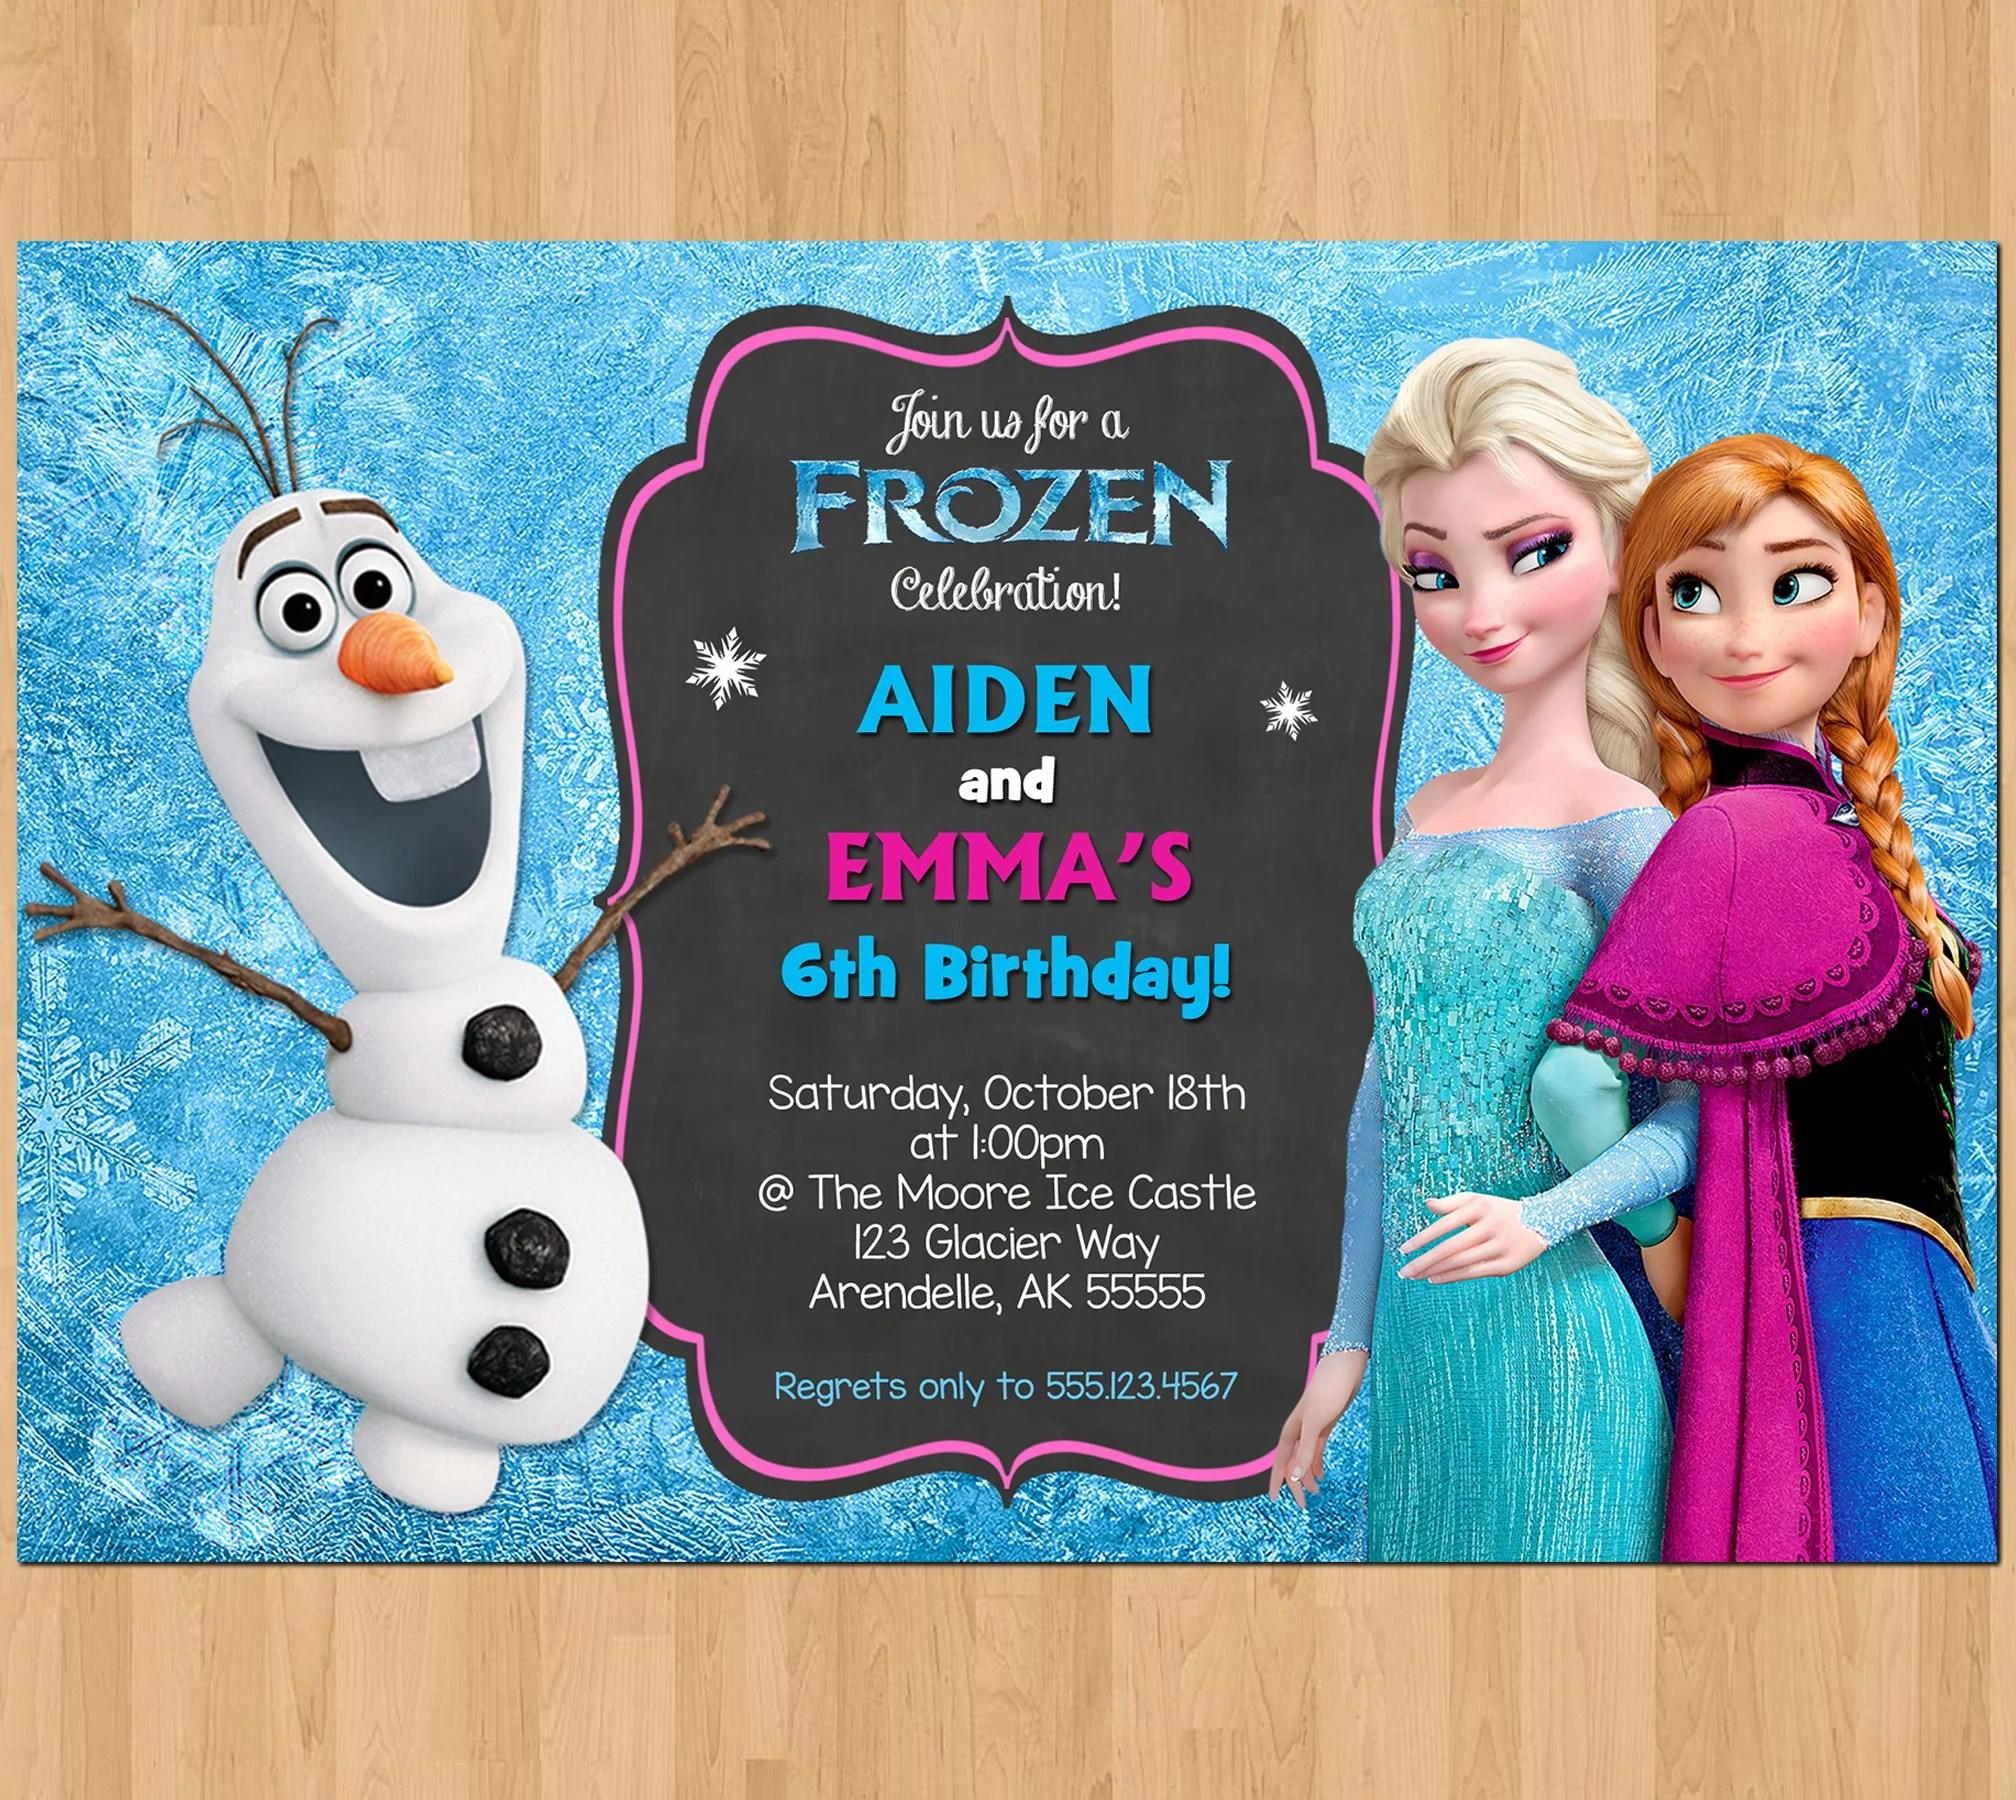 sibling birthday invitation frozen invitation olaf elsa anna double invitation dual twin printable birthday party digital invite boy girl